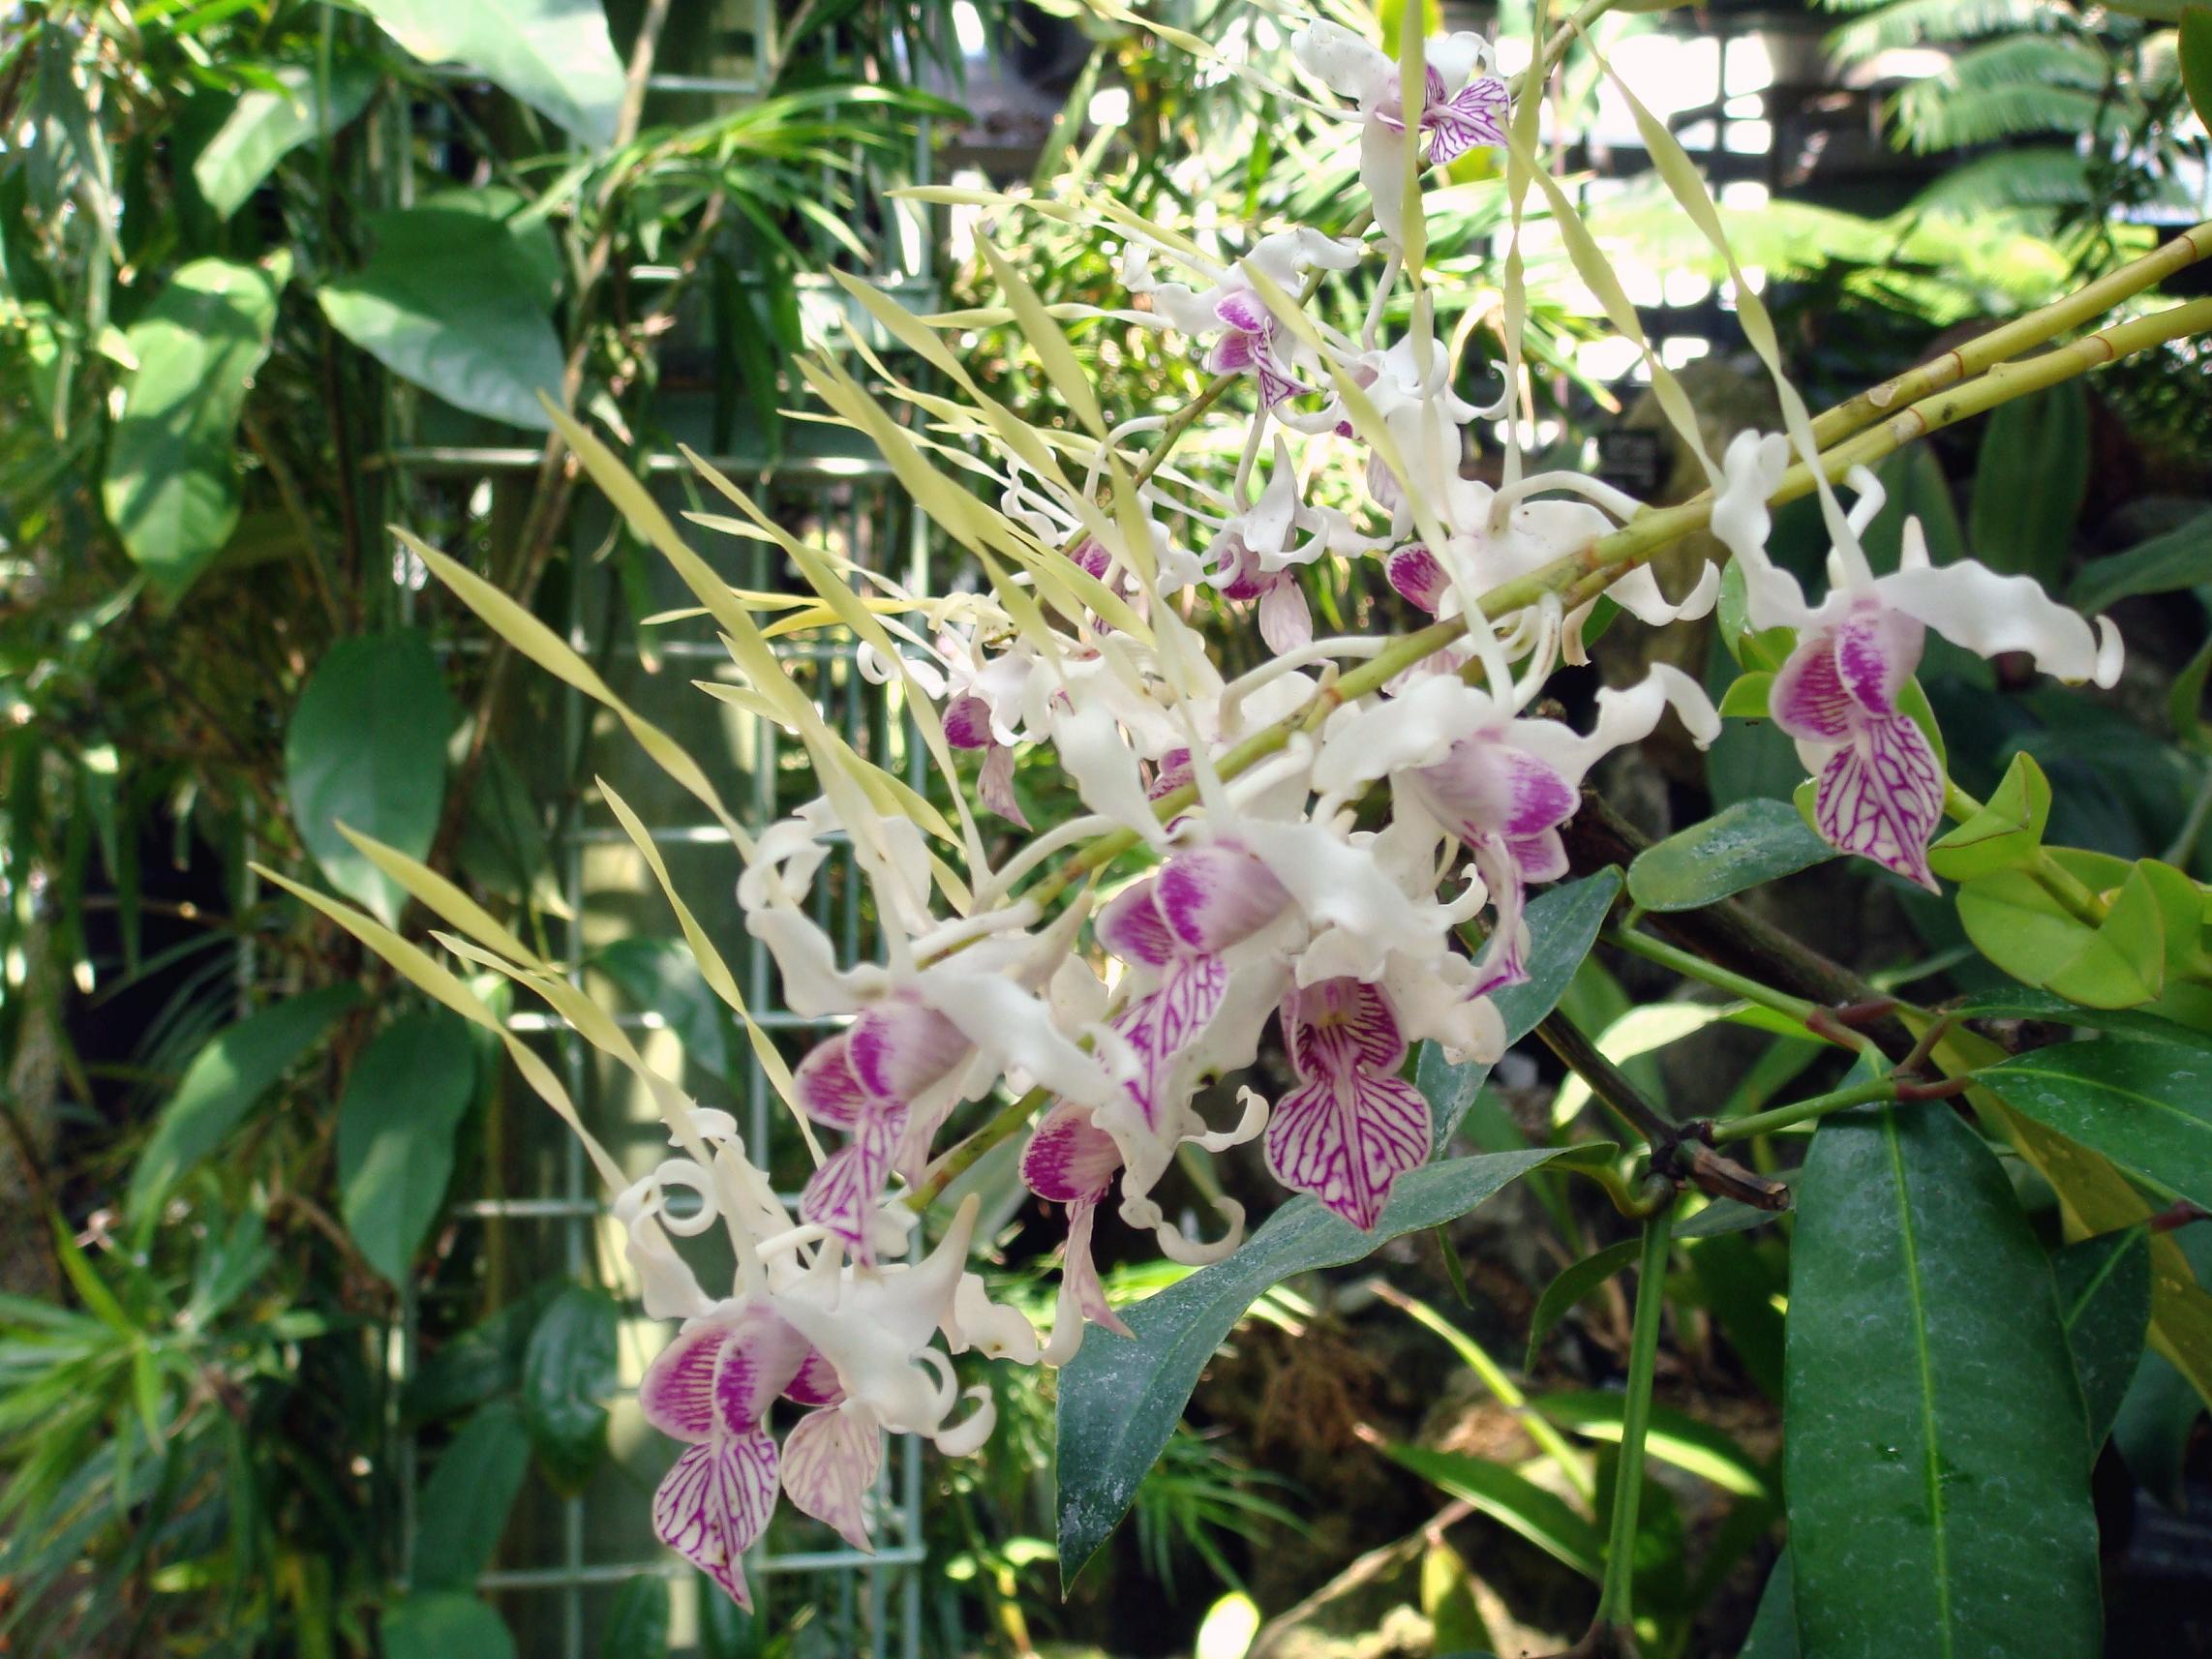 http://orchids.la.coocan.jp/Dendrobium/Dendrobium%20stratiotes/DSC07240.JPG